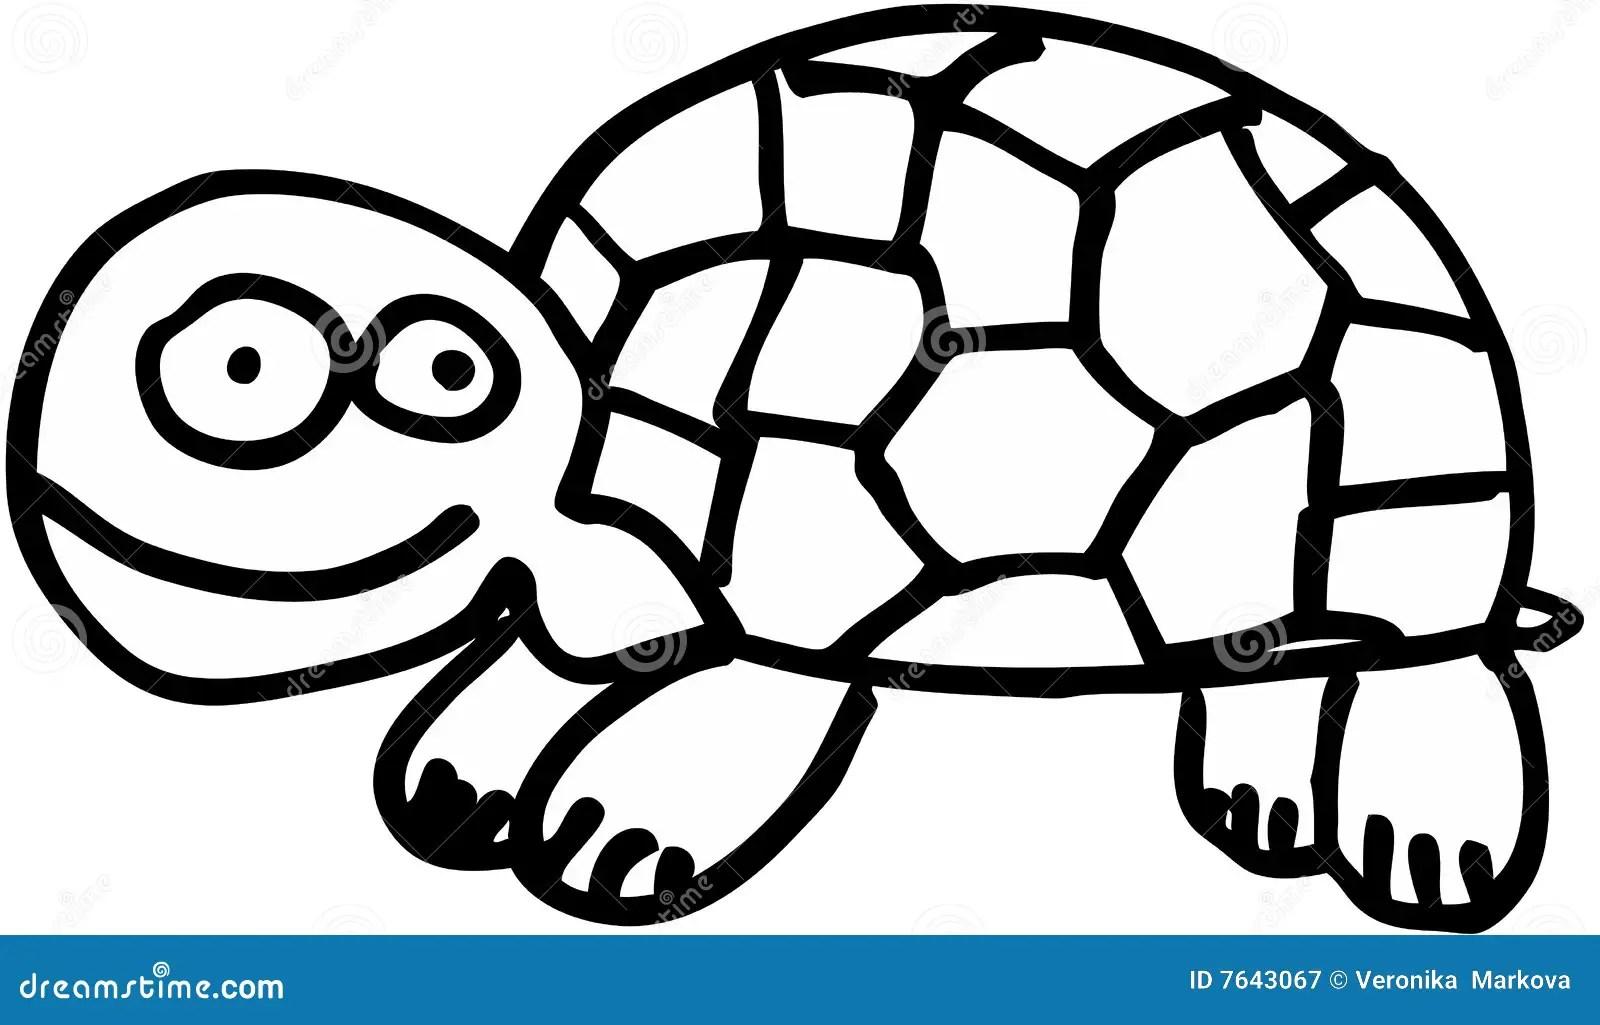 Crazy Tortoise Royalty Free Stock Photography